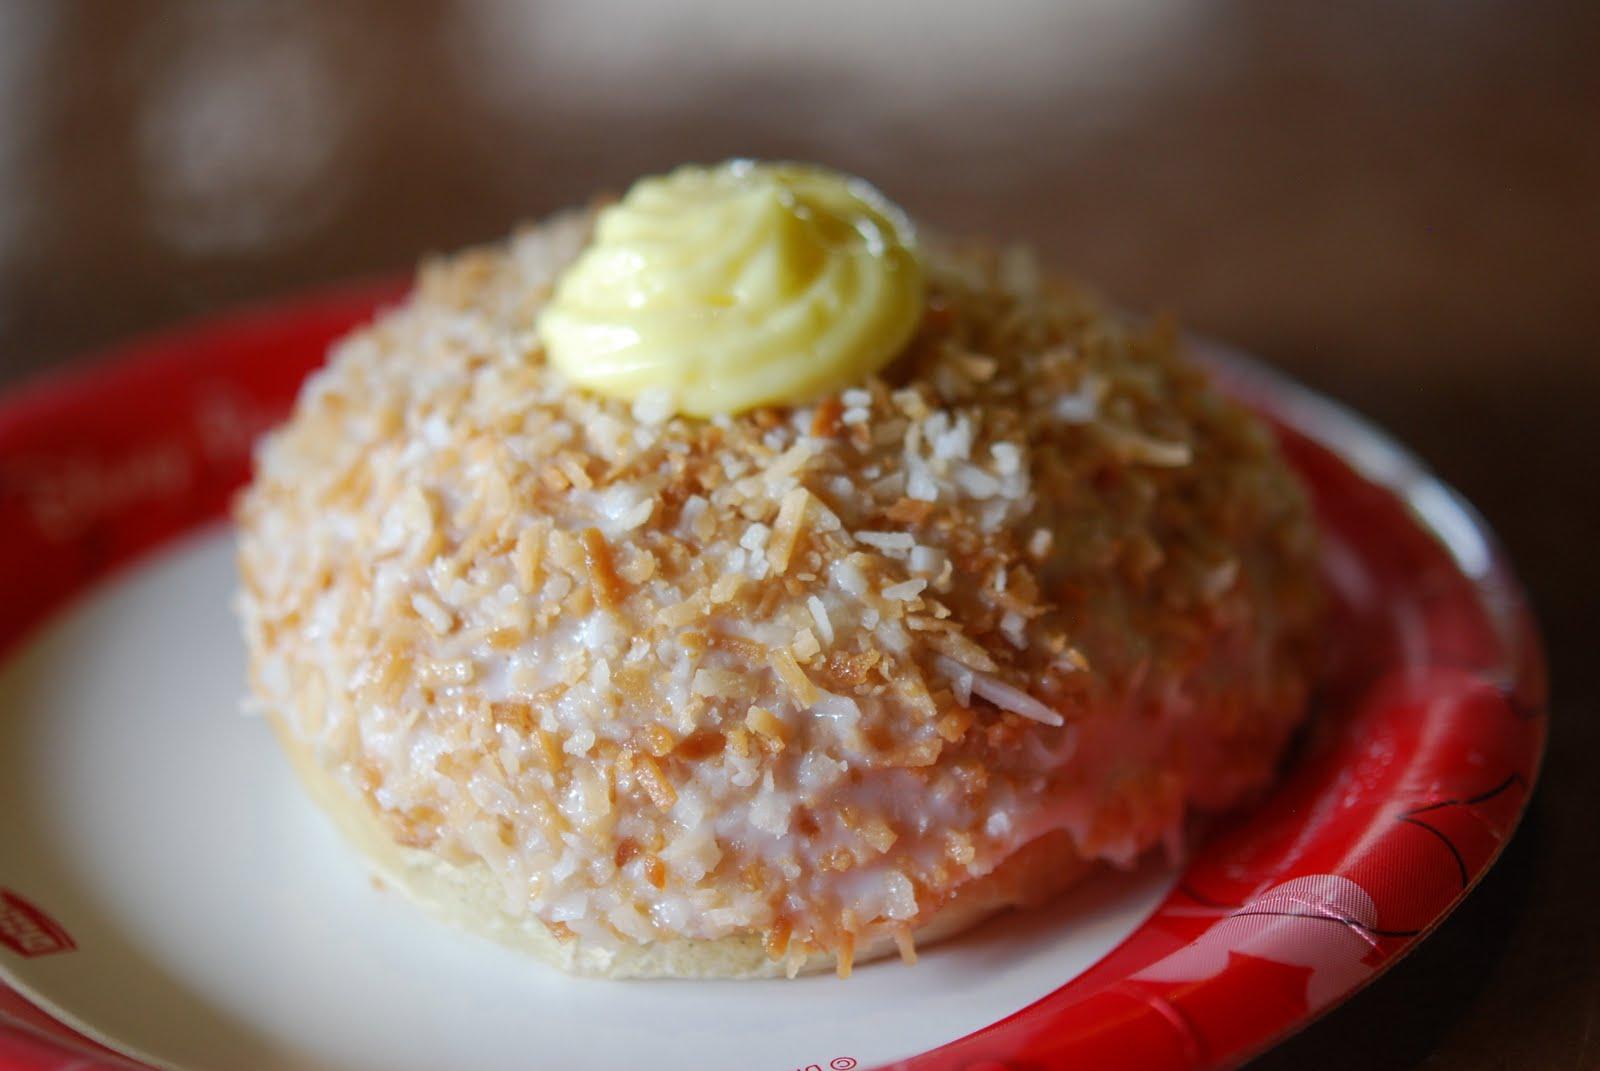 Epcot Kringla Bakery Cake With Strawberries